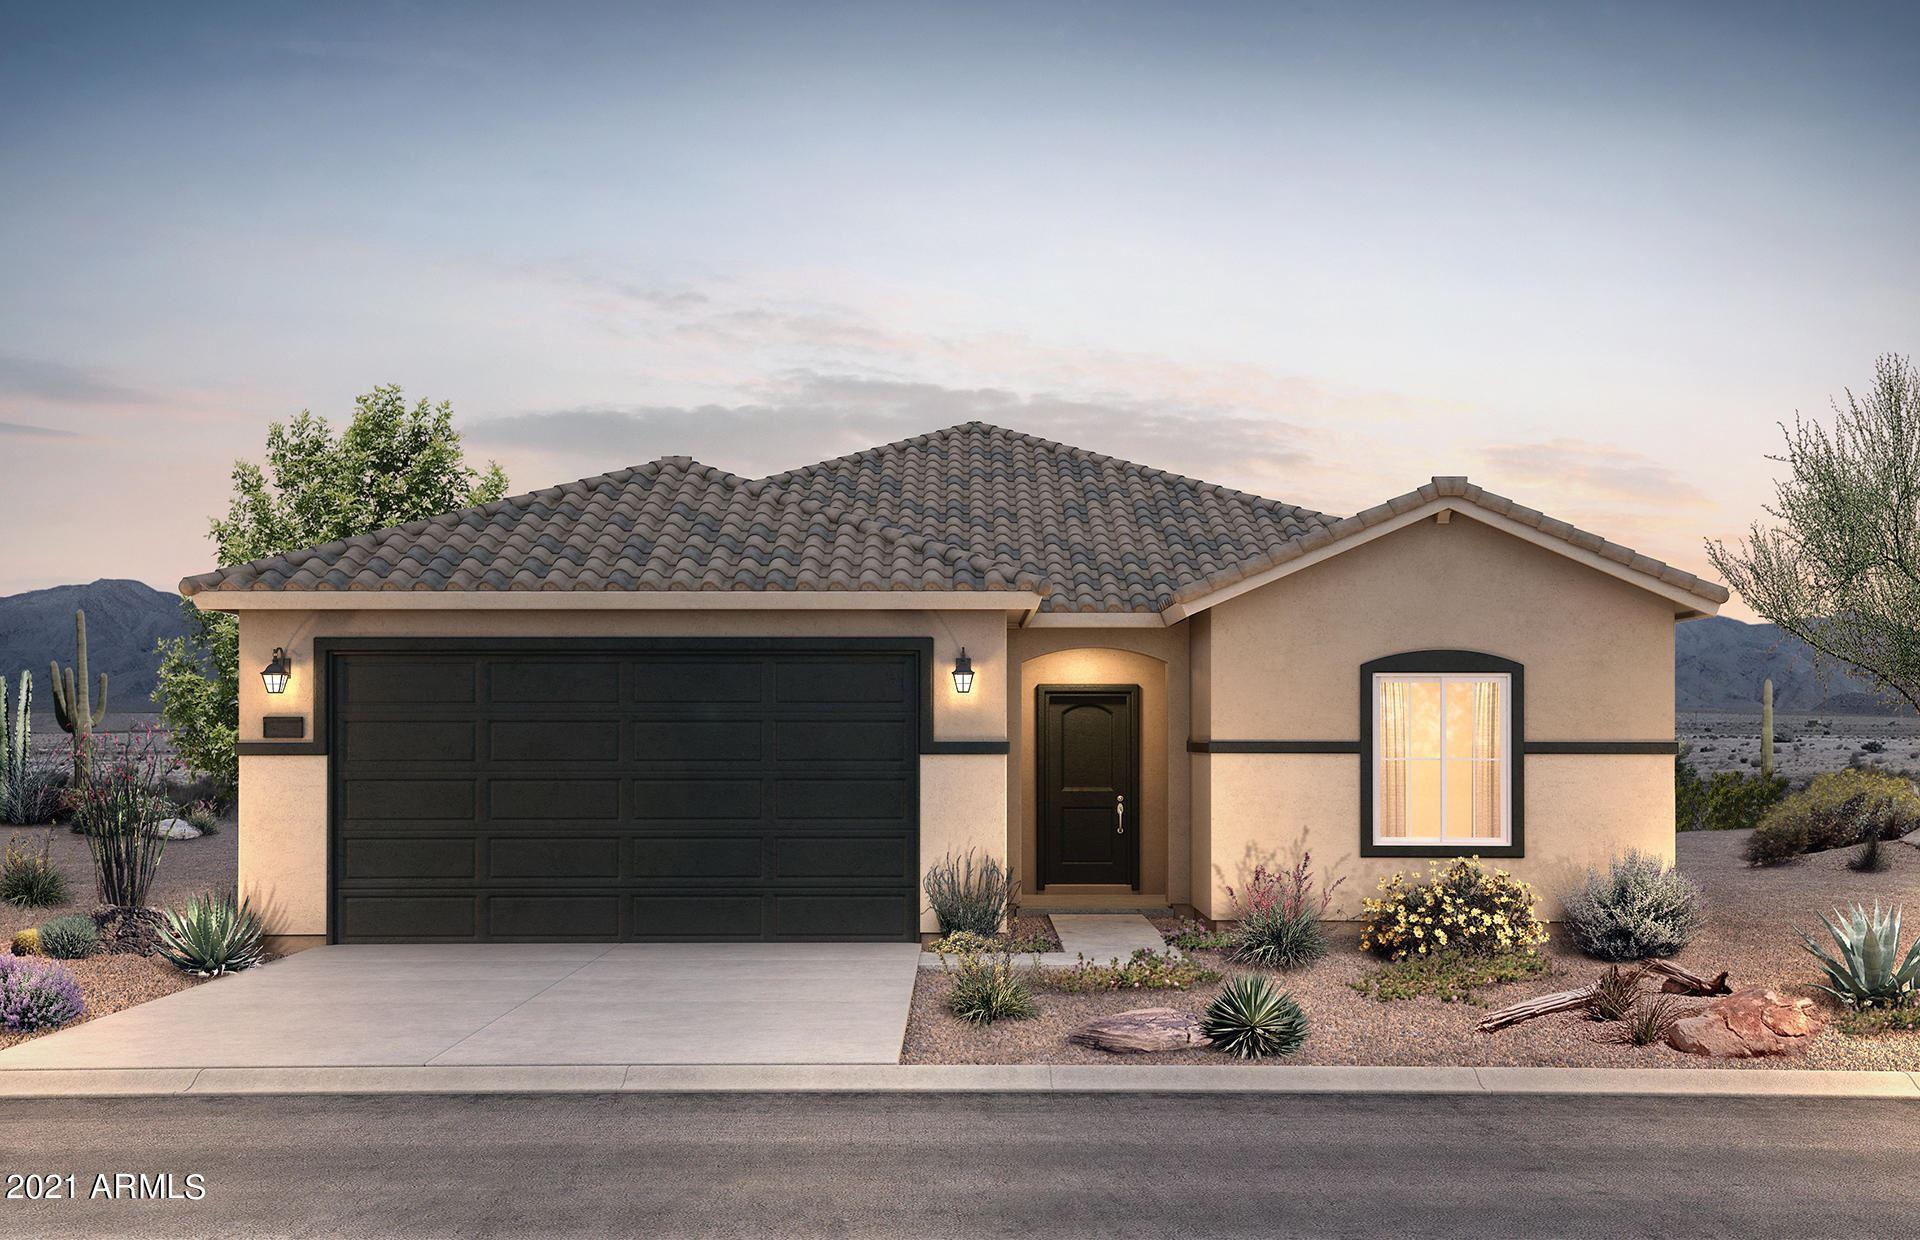 Photo for 43764 W MESCAL Street, Maricopa, AZ 85138 (MLS # 6266879)